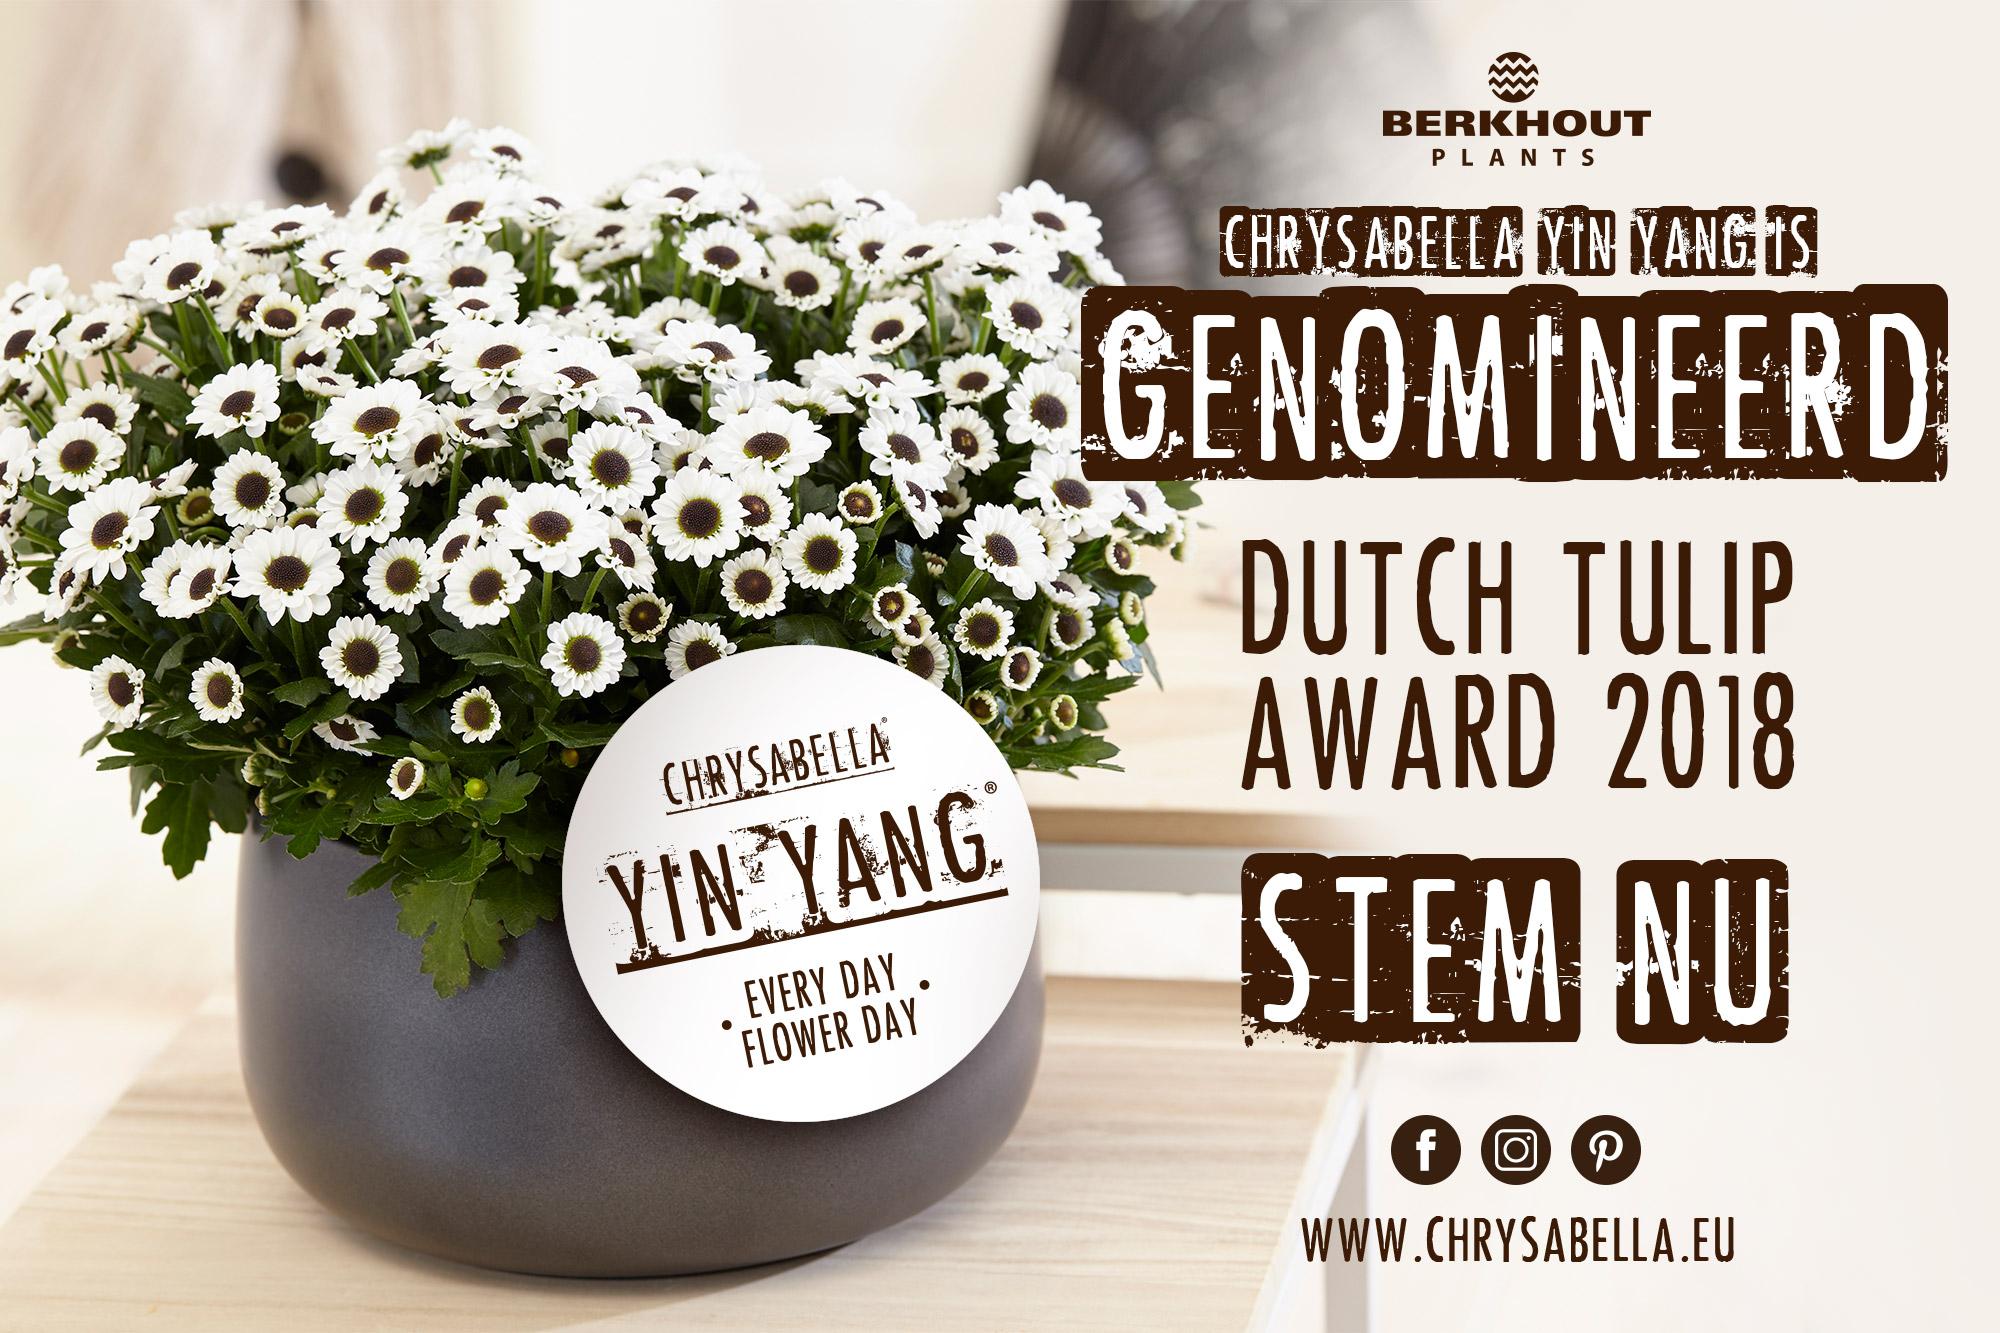 berkhout chrysabella yin yang genomineerd